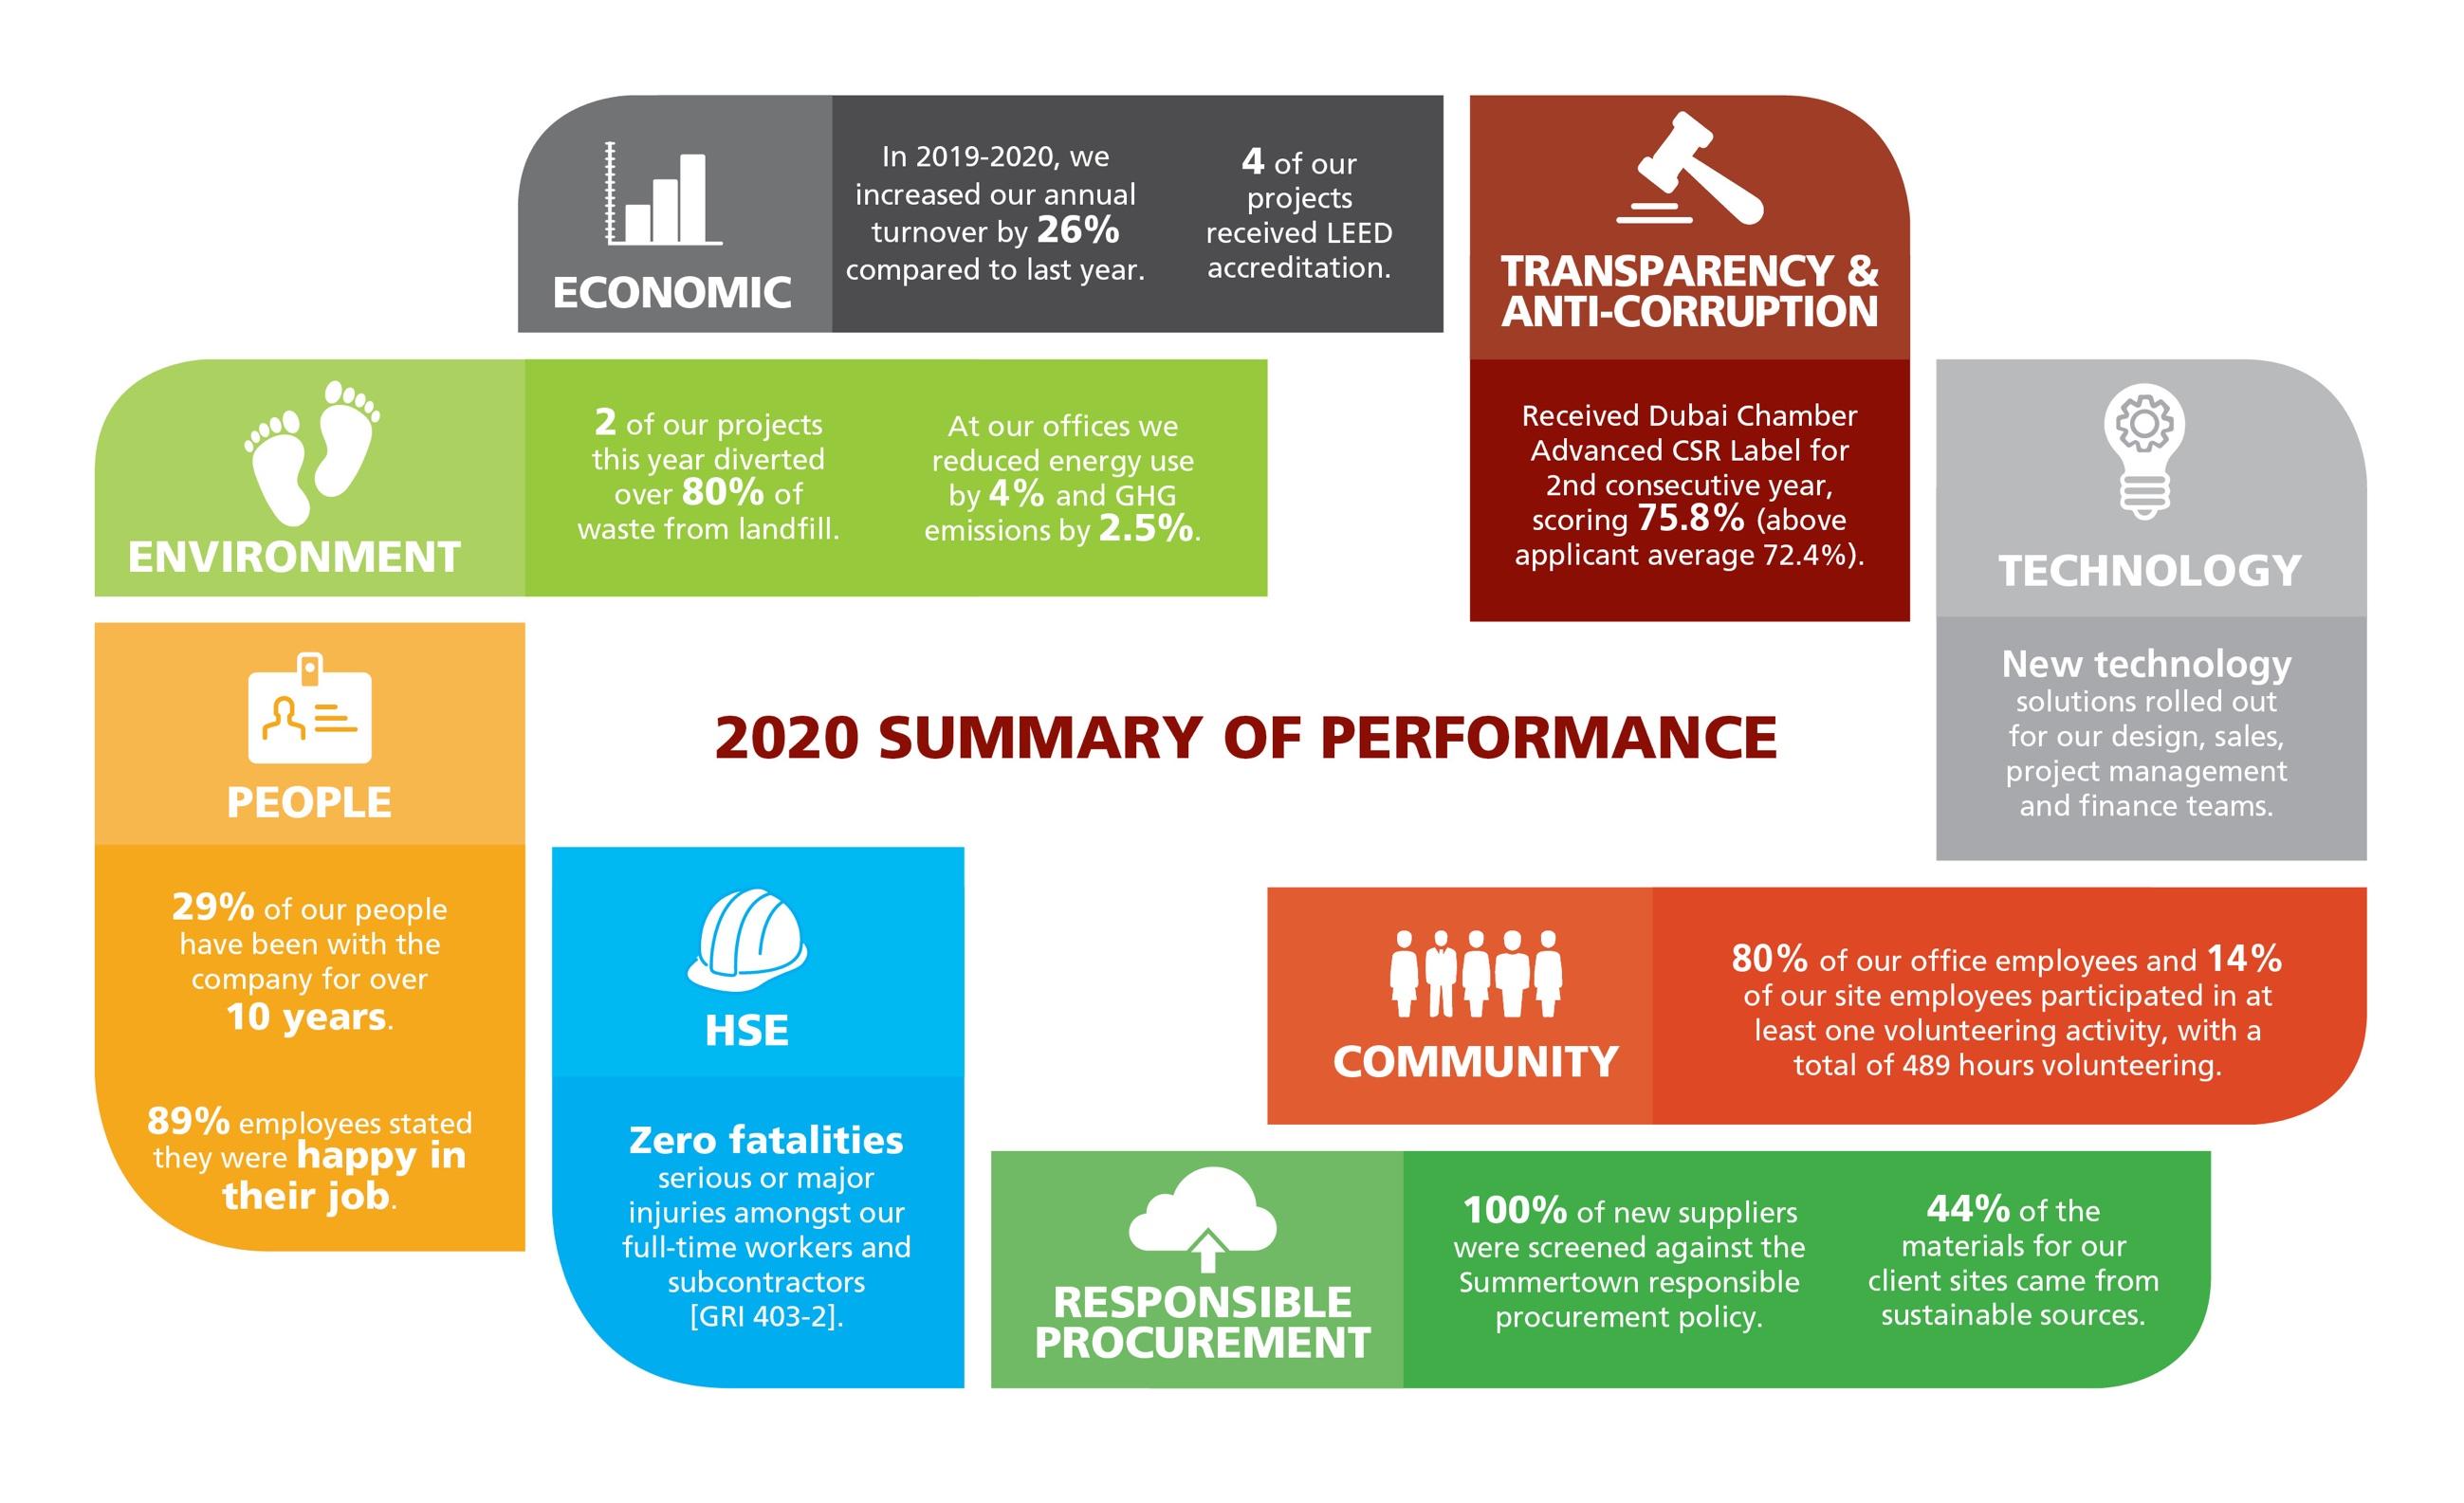 Summertown's 2020 Summary of Performance chart